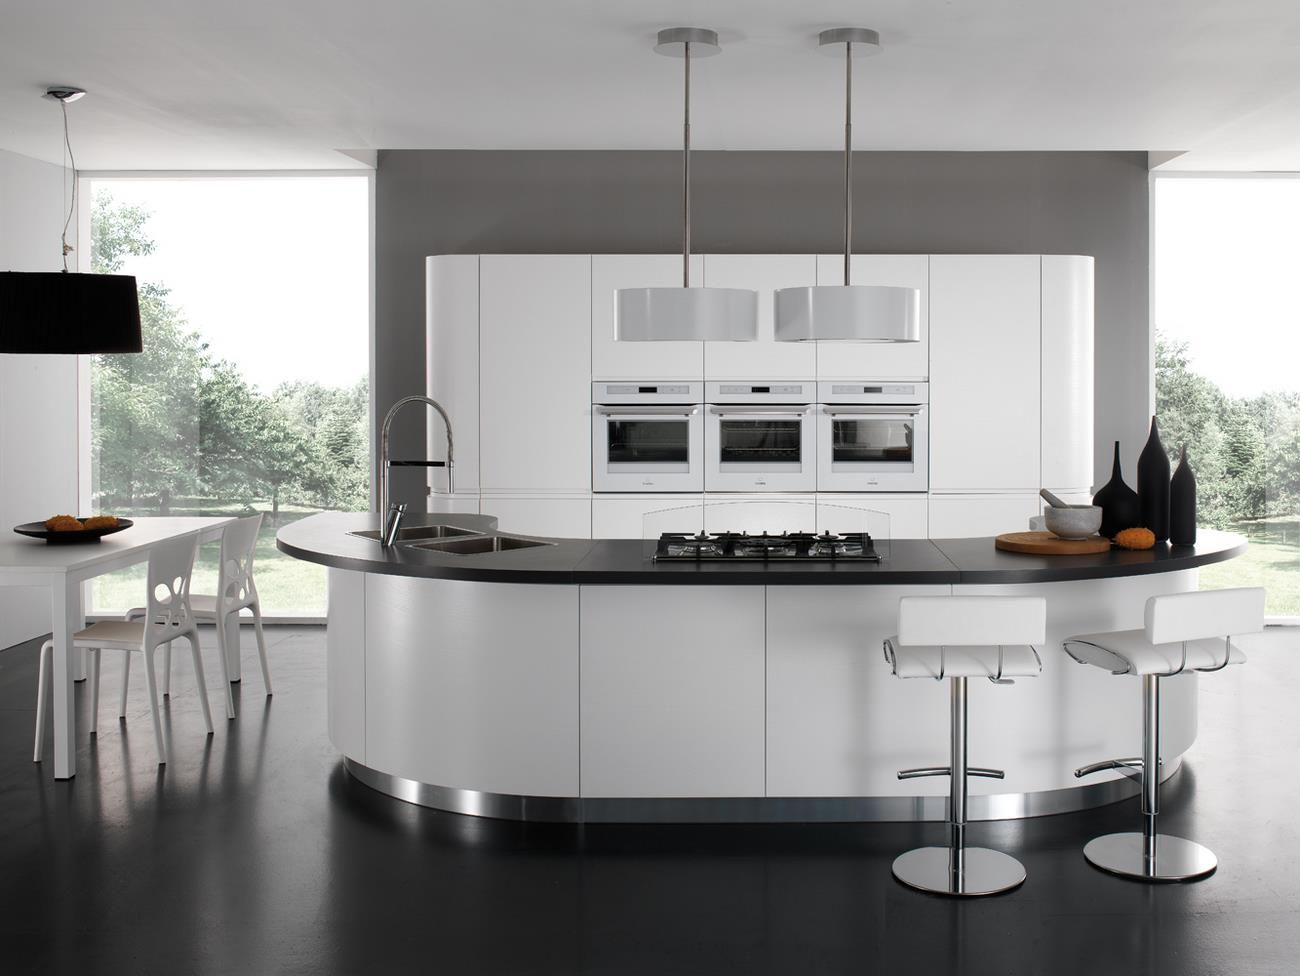 Le Pi Belle Cucine Moderne. Cucine Moderne Cucine Spar Catalogo Per ...